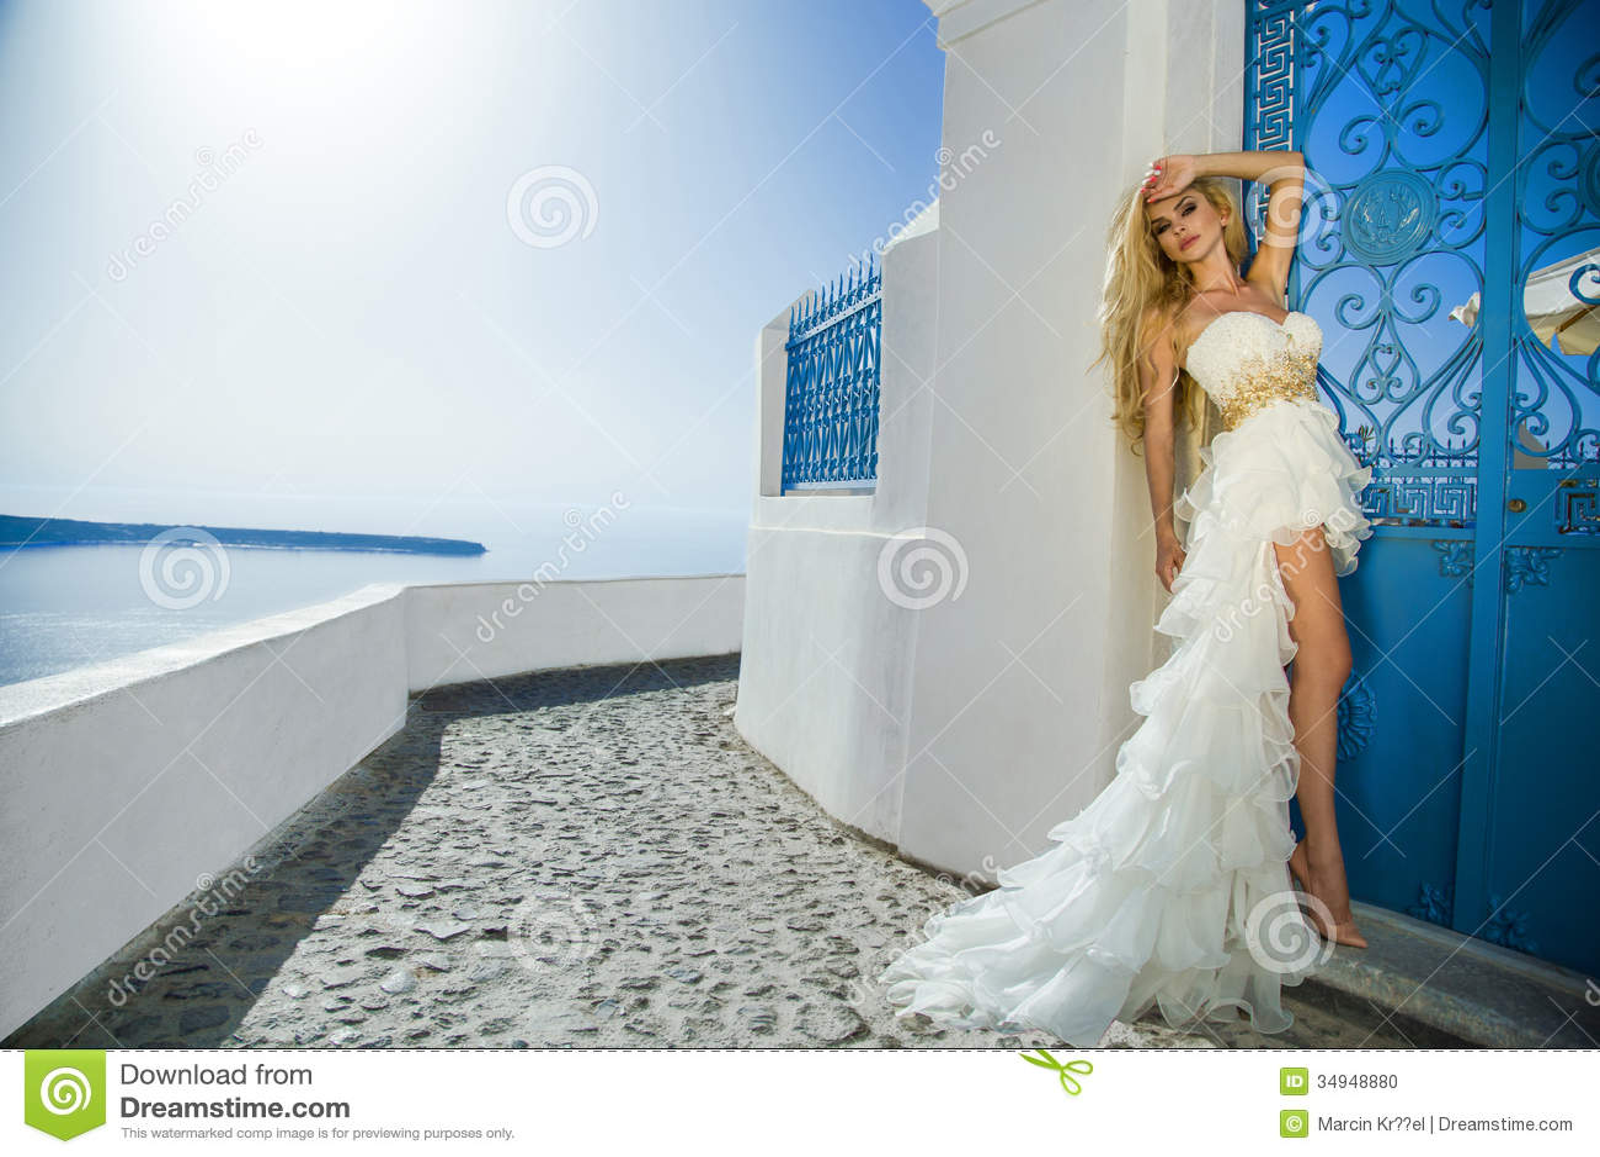 The Beautiful Bride In A Wedding Dress On Santorini In